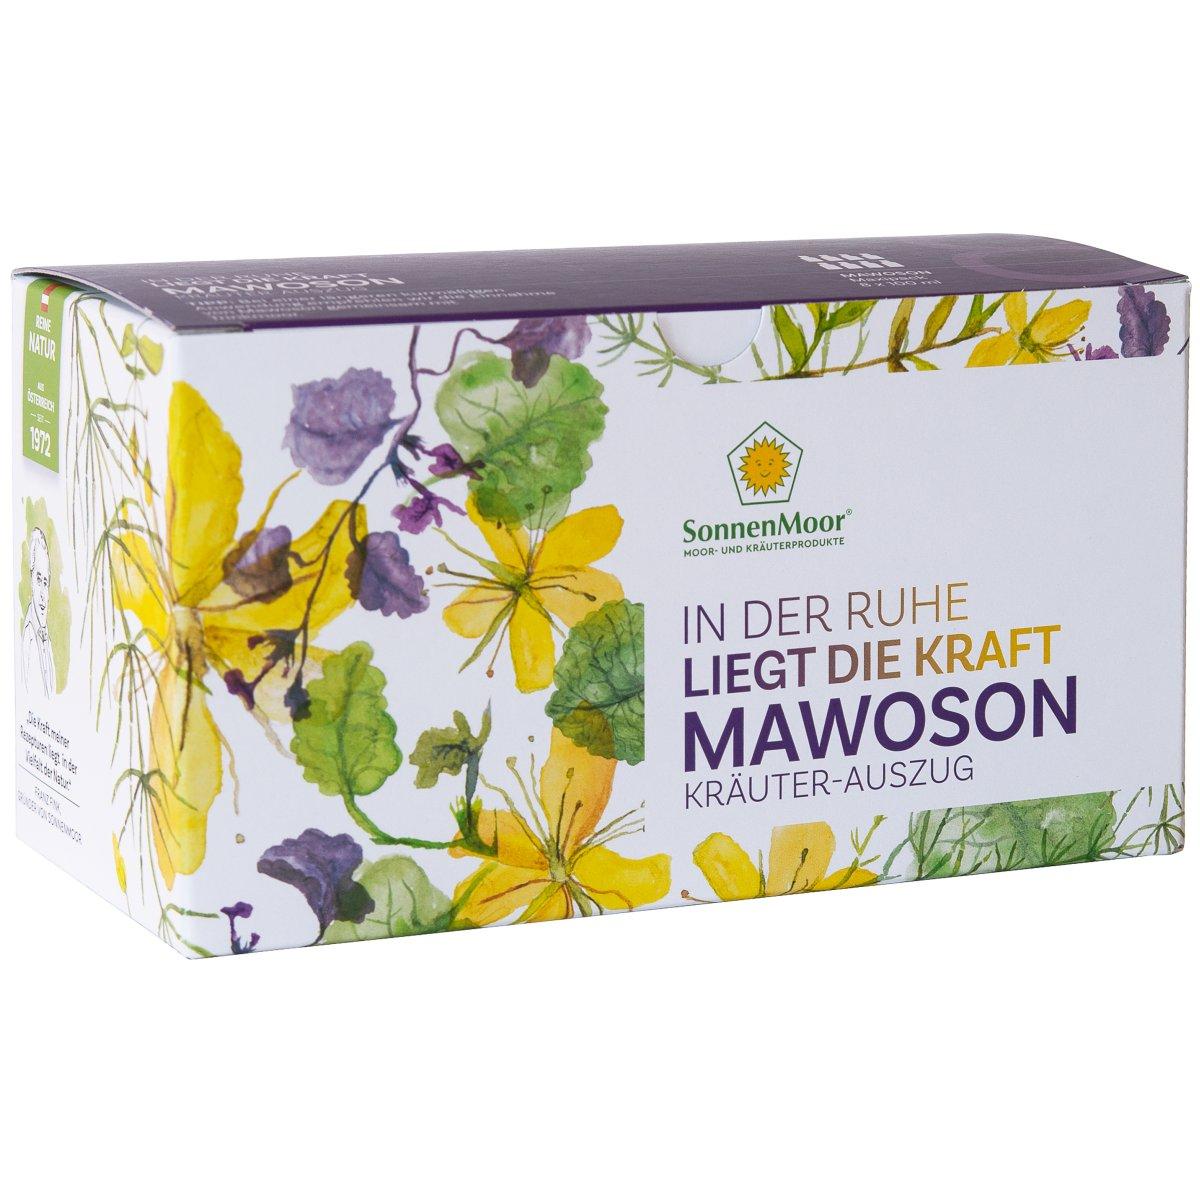 Mawoson 8 x 100 ml